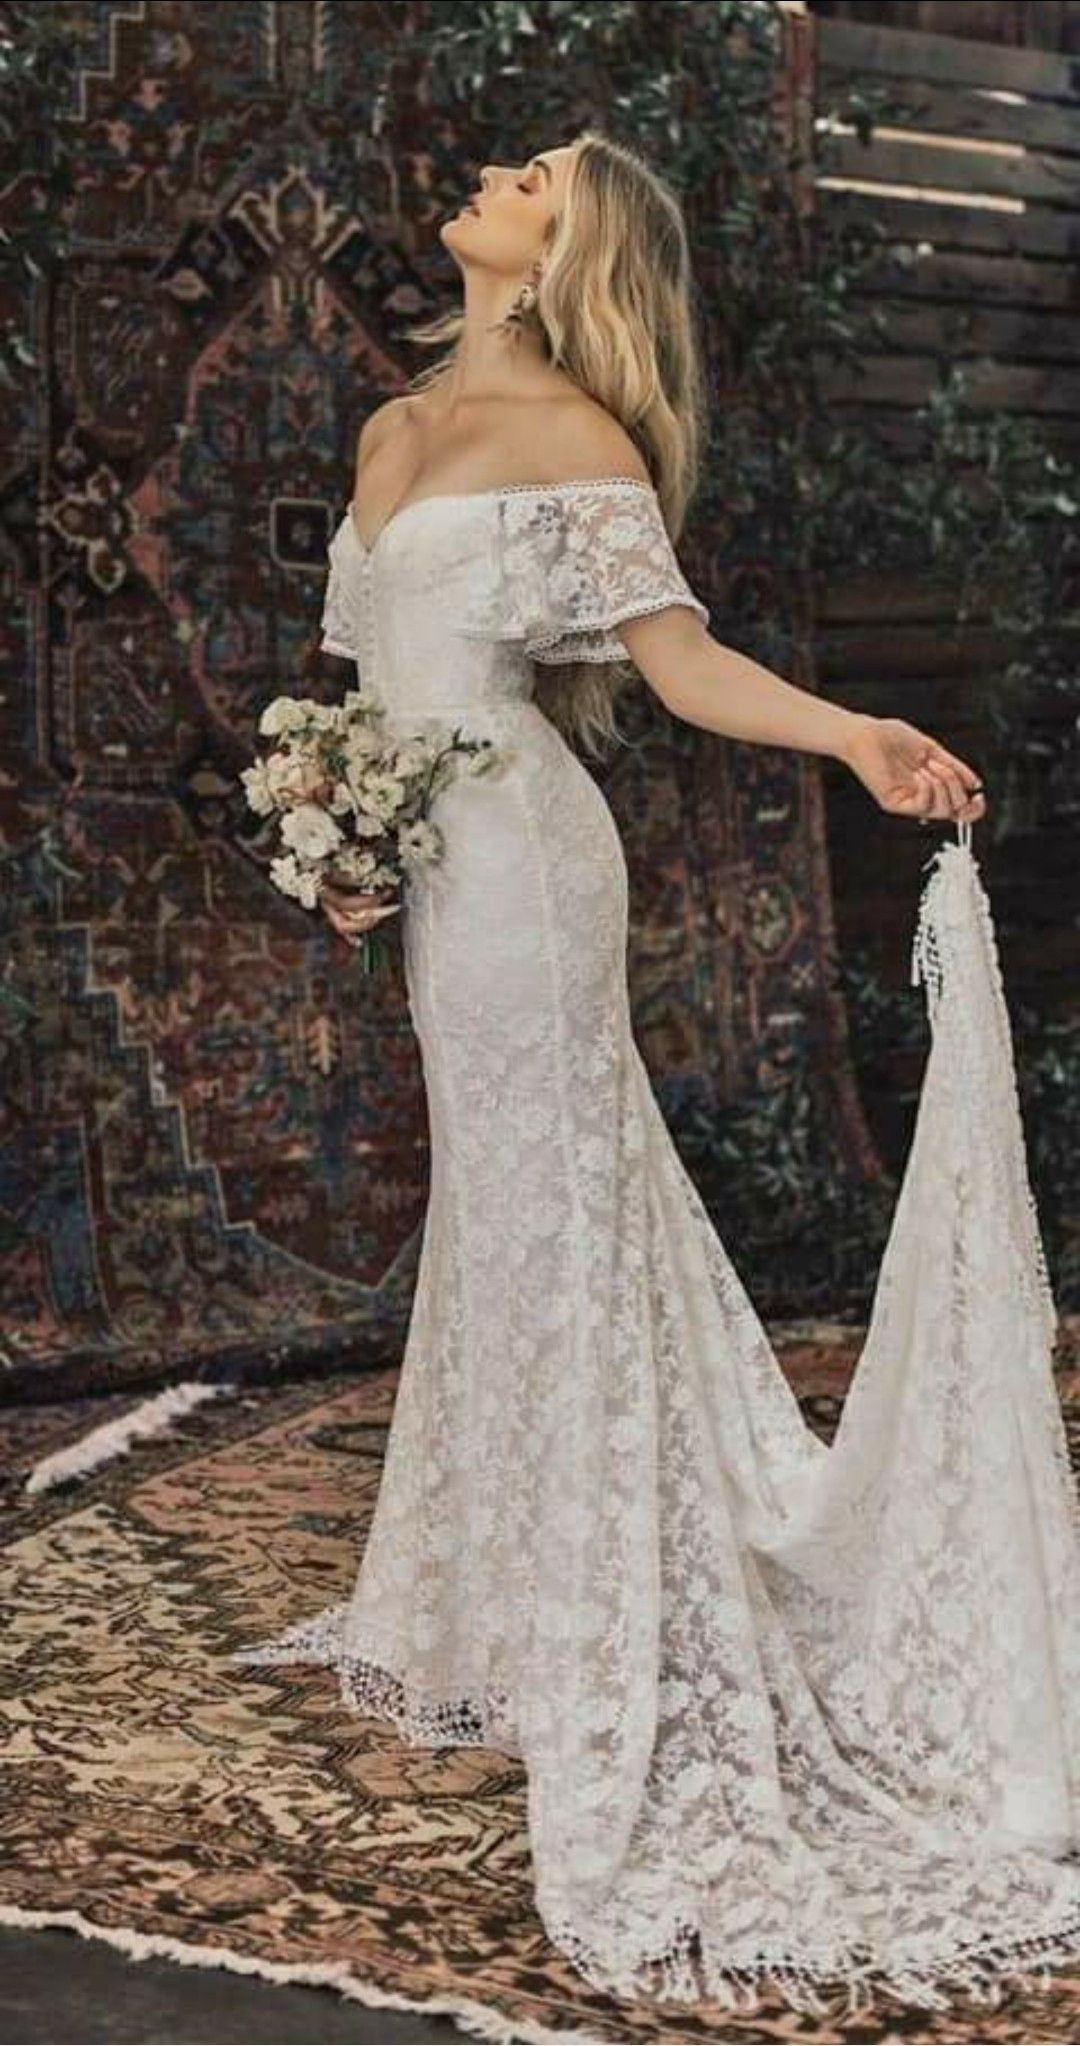 Pin by Suzette Bekker on Tying the knot / Wedding in 2020